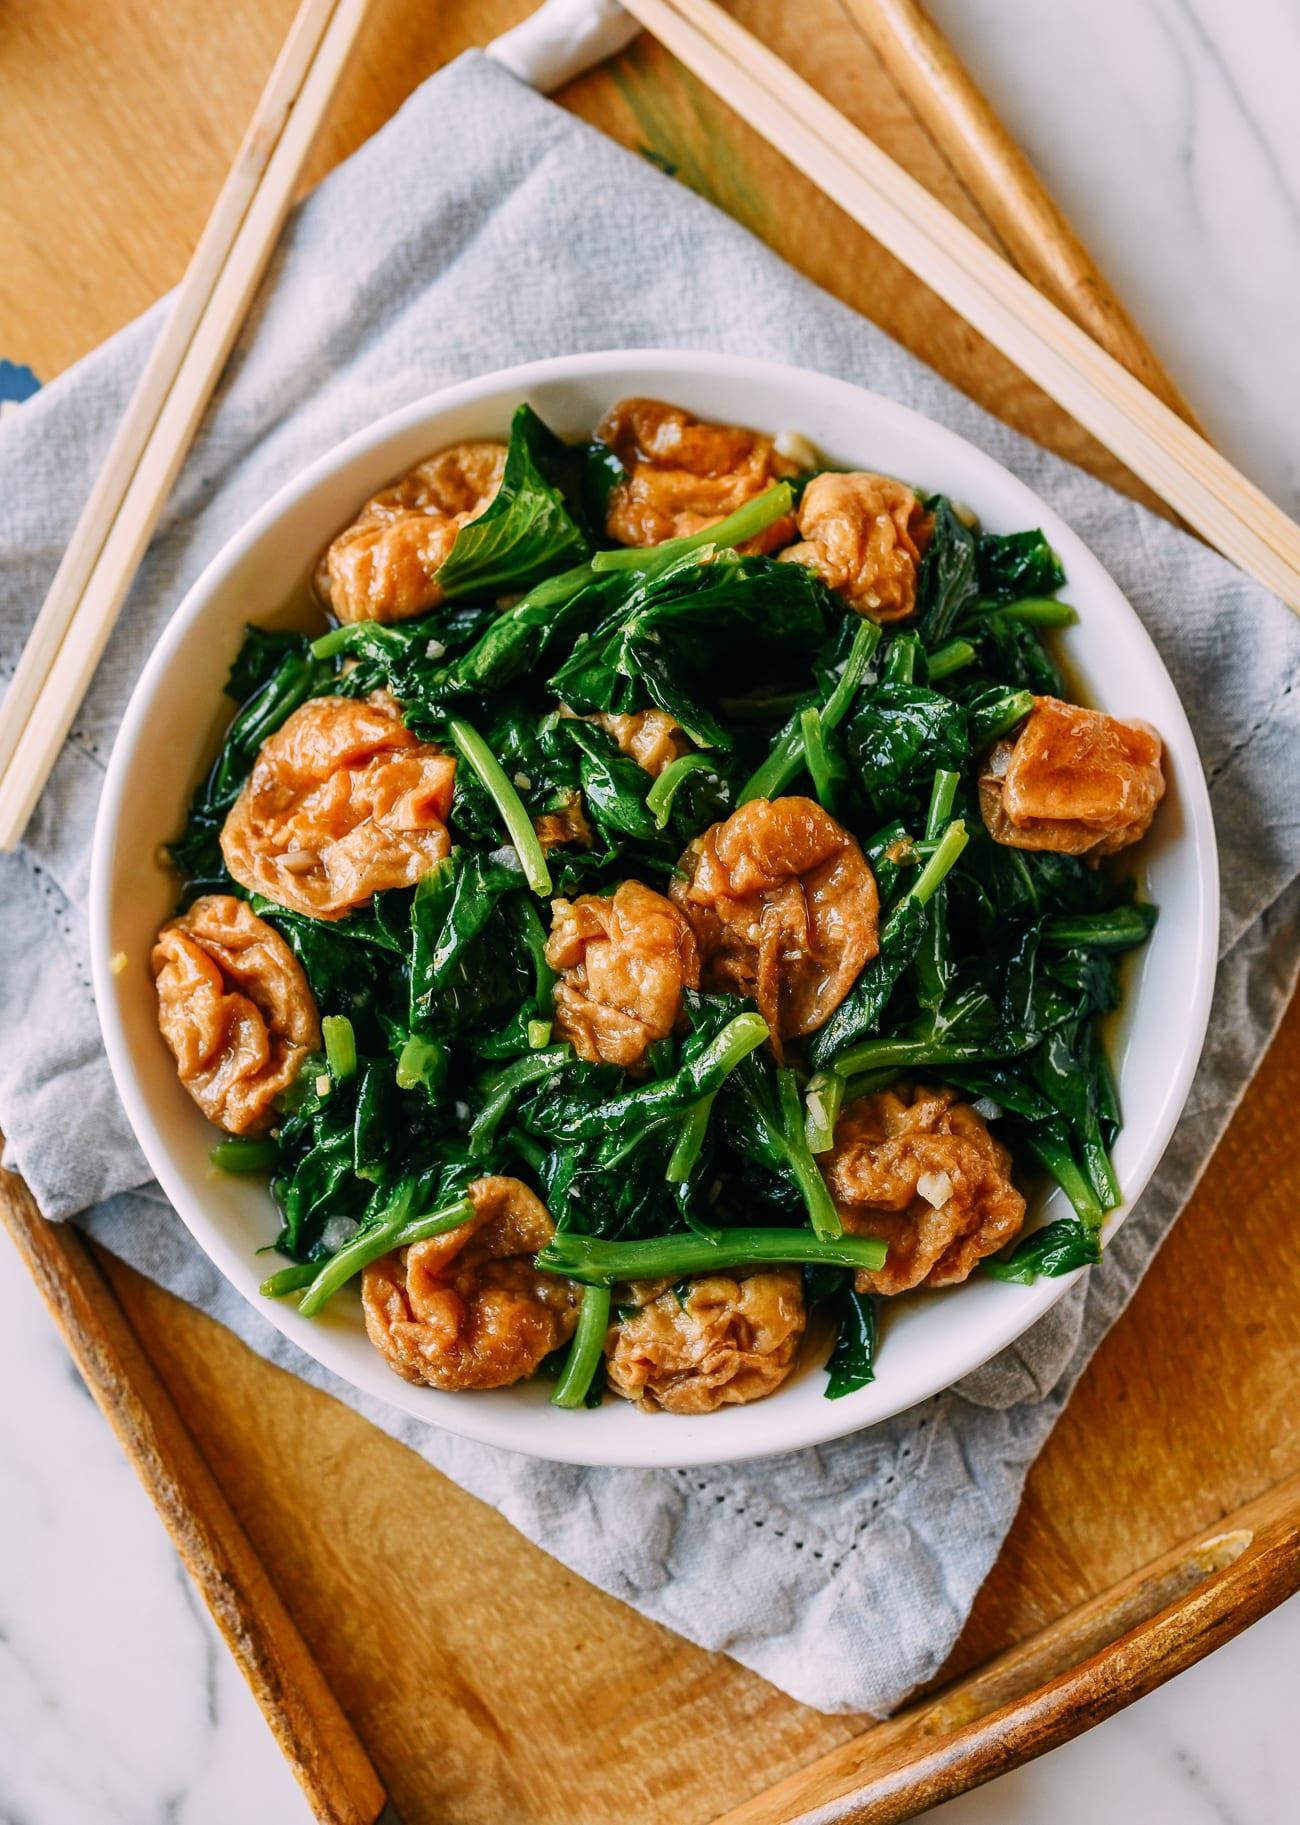 Pea Tips and Seitan Puffs Stir-fry